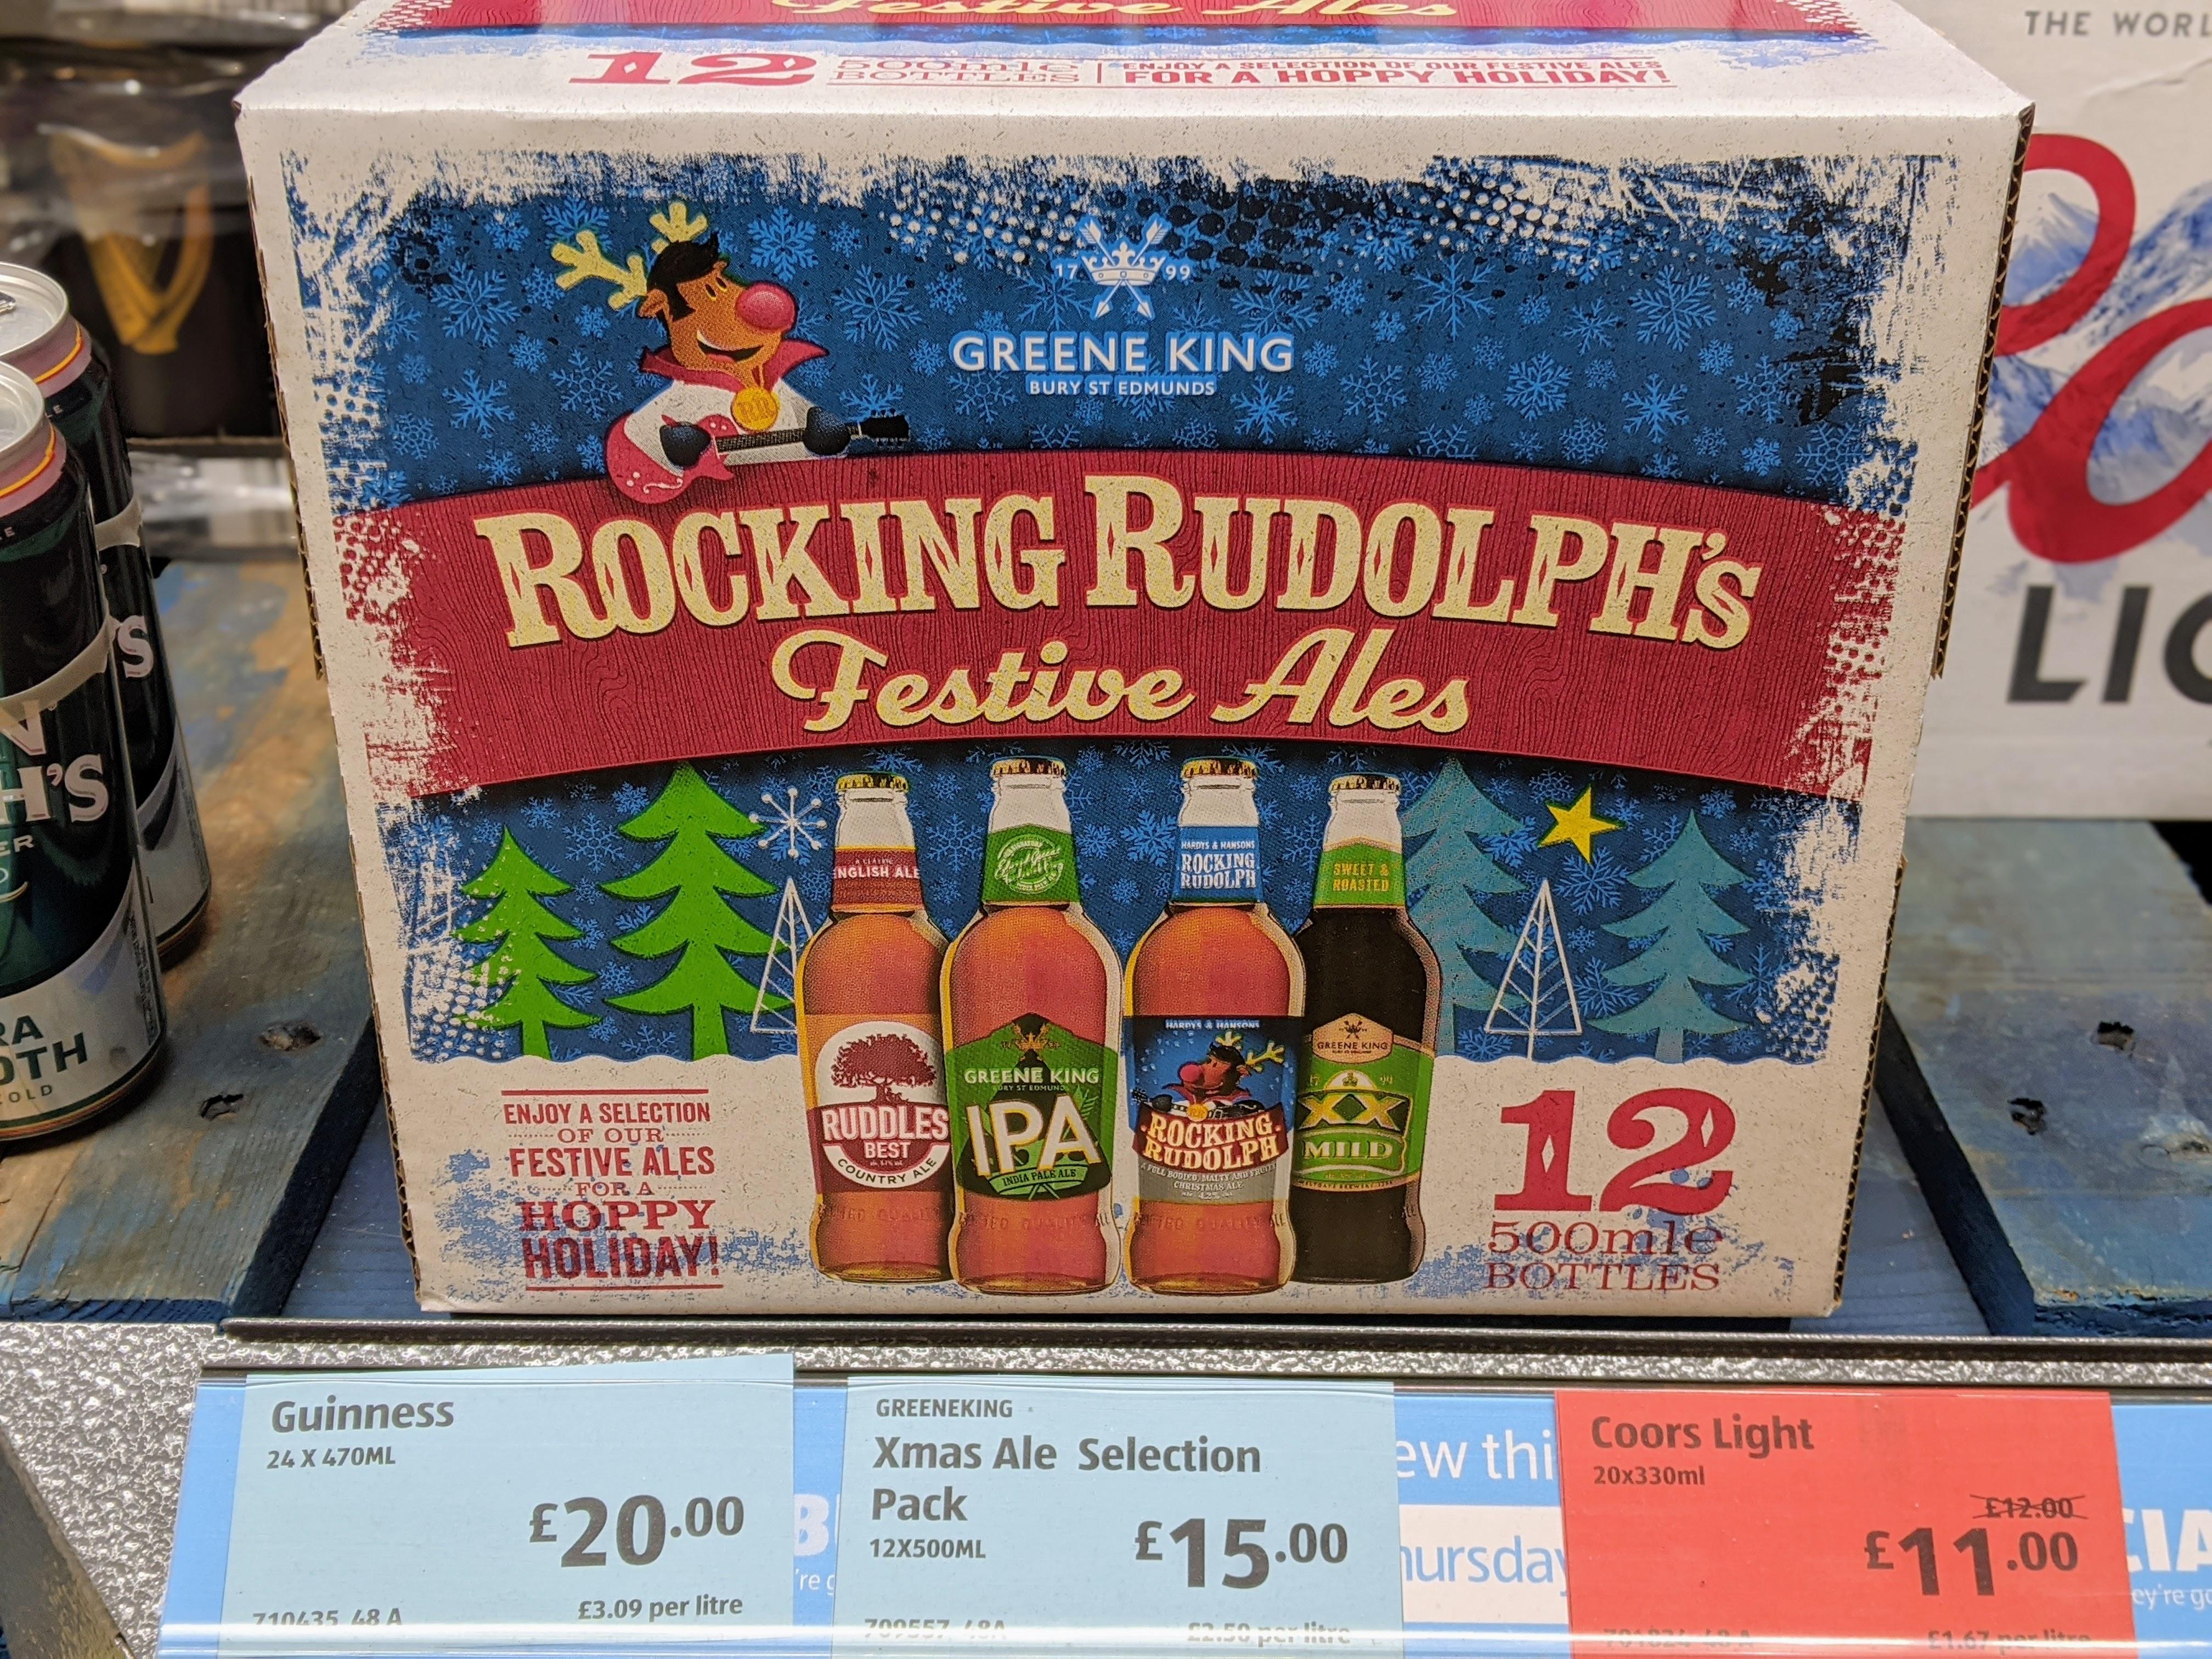 Greene King Christmas Ale Box (12 x 500ml Bottles) £15 @ Aldi (Hilton, South Derbyshire)